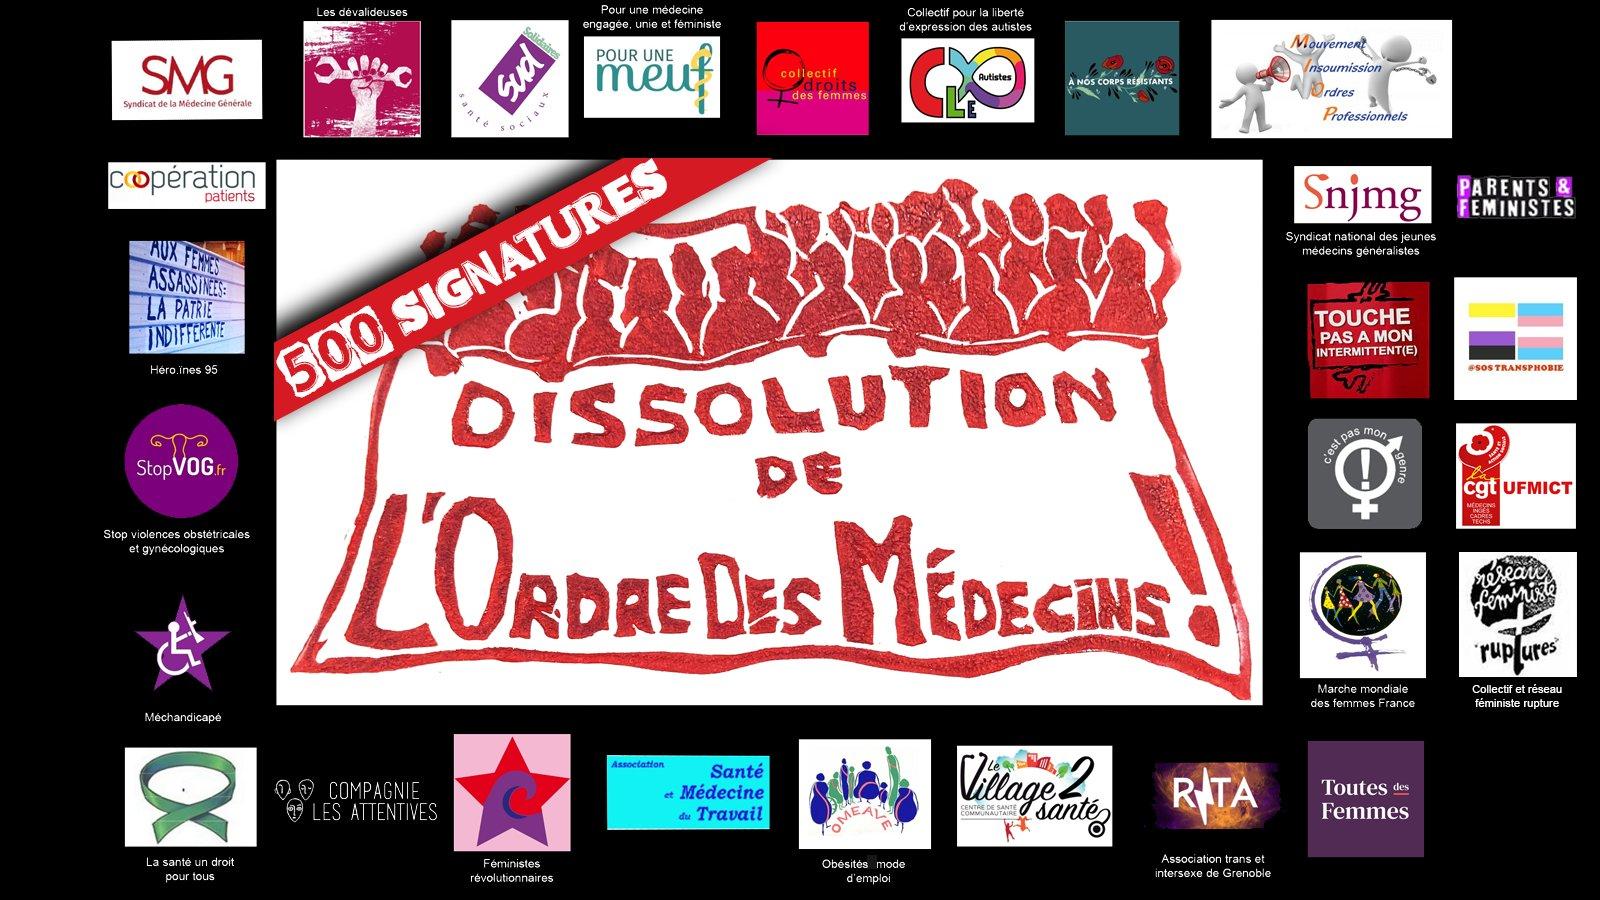 #DissolutionOrdreDesMedecins